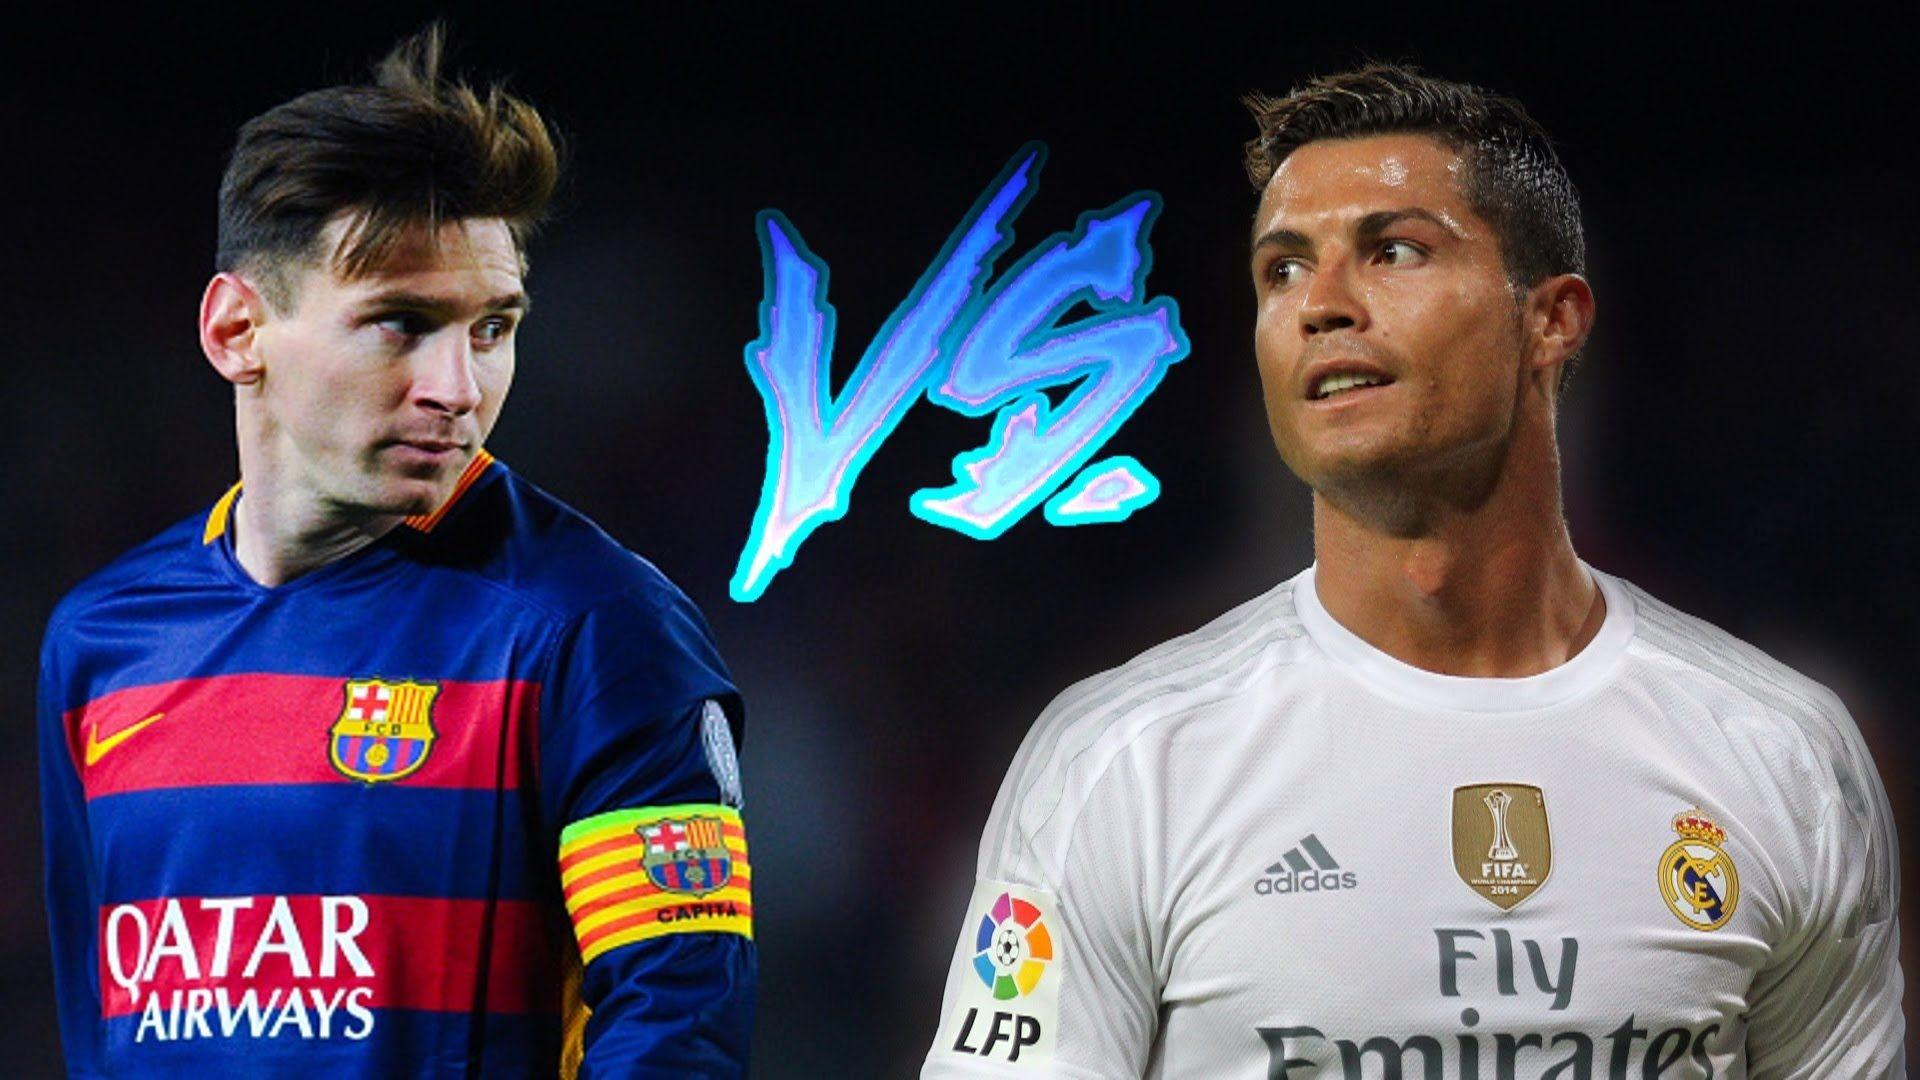 Just posted! Messi Vs C.Ronaldo- Amazing skills show- HD  https://youtube.com/watch?v=Fqn_4ocPSOU   Football   Pinterest   Messi,  Ronaldo and Lionel messi